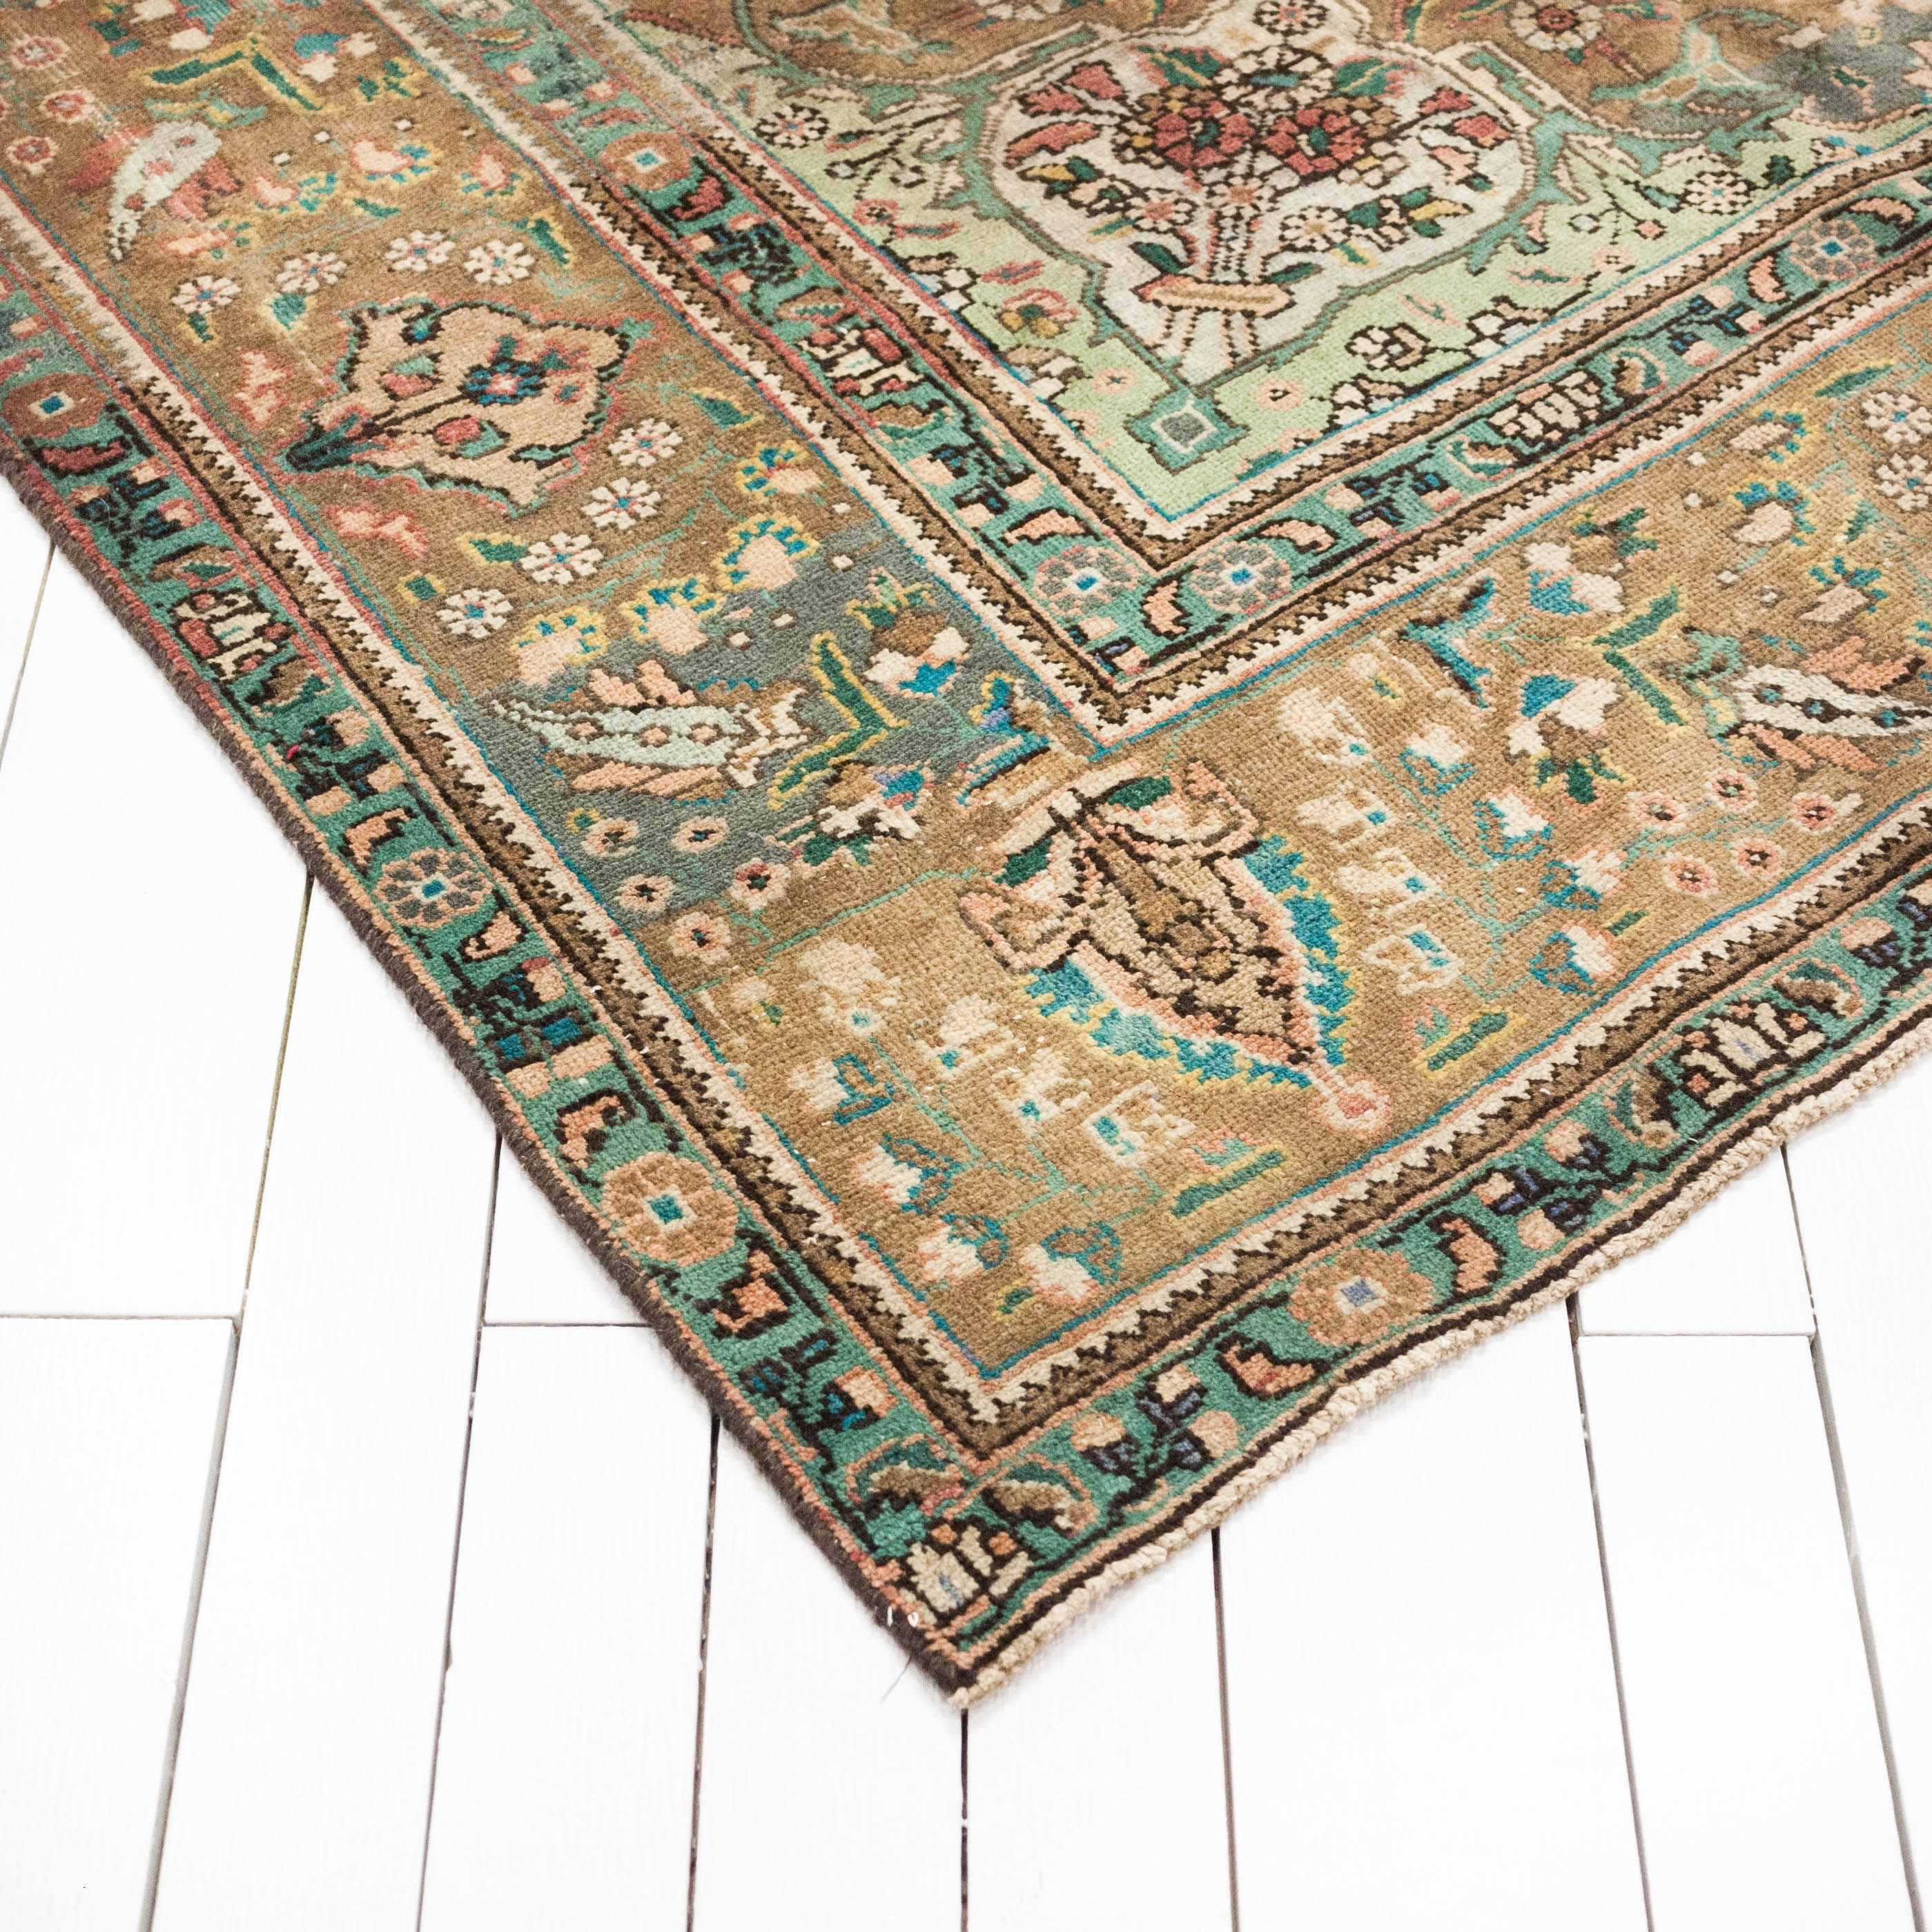 Our Collection Of Vintage And Modern Rental Furnishings Vintage Persian Rug Vintage Vintage Rentals